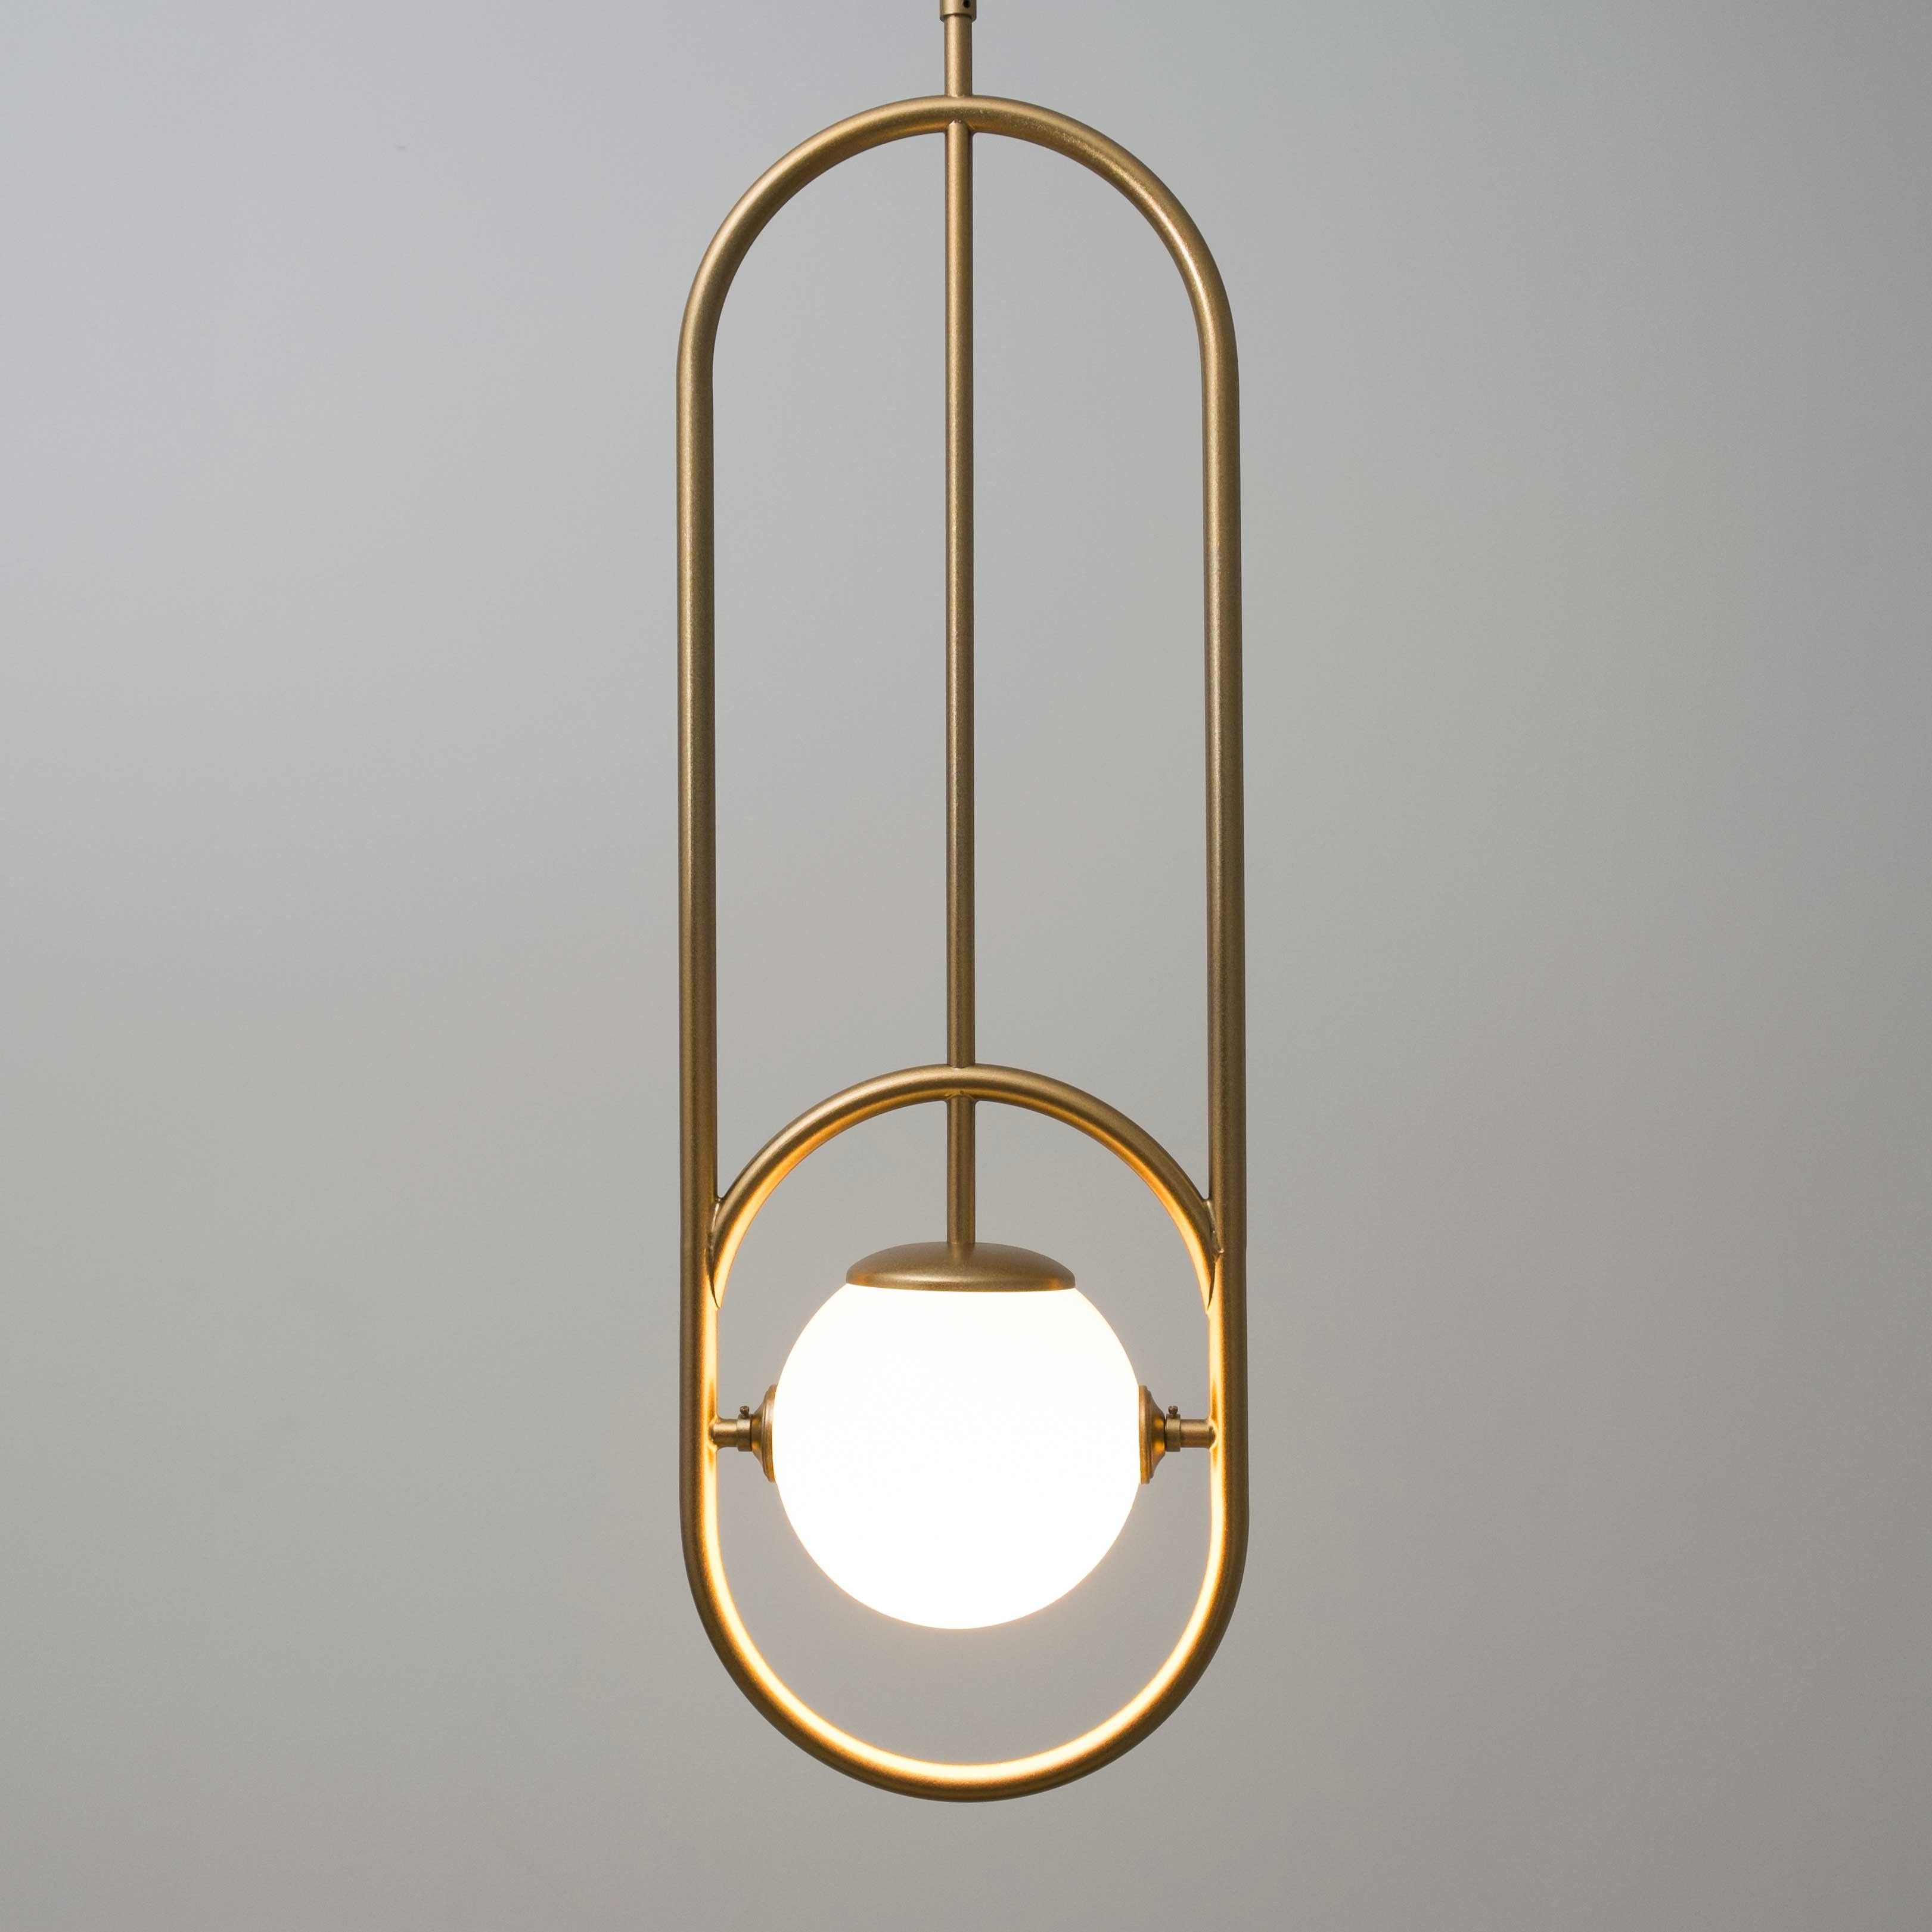 Lampara Vintage De Techo Bola De Cristal Katrin Ceiling Lamp Hanging Lights Light Decorations